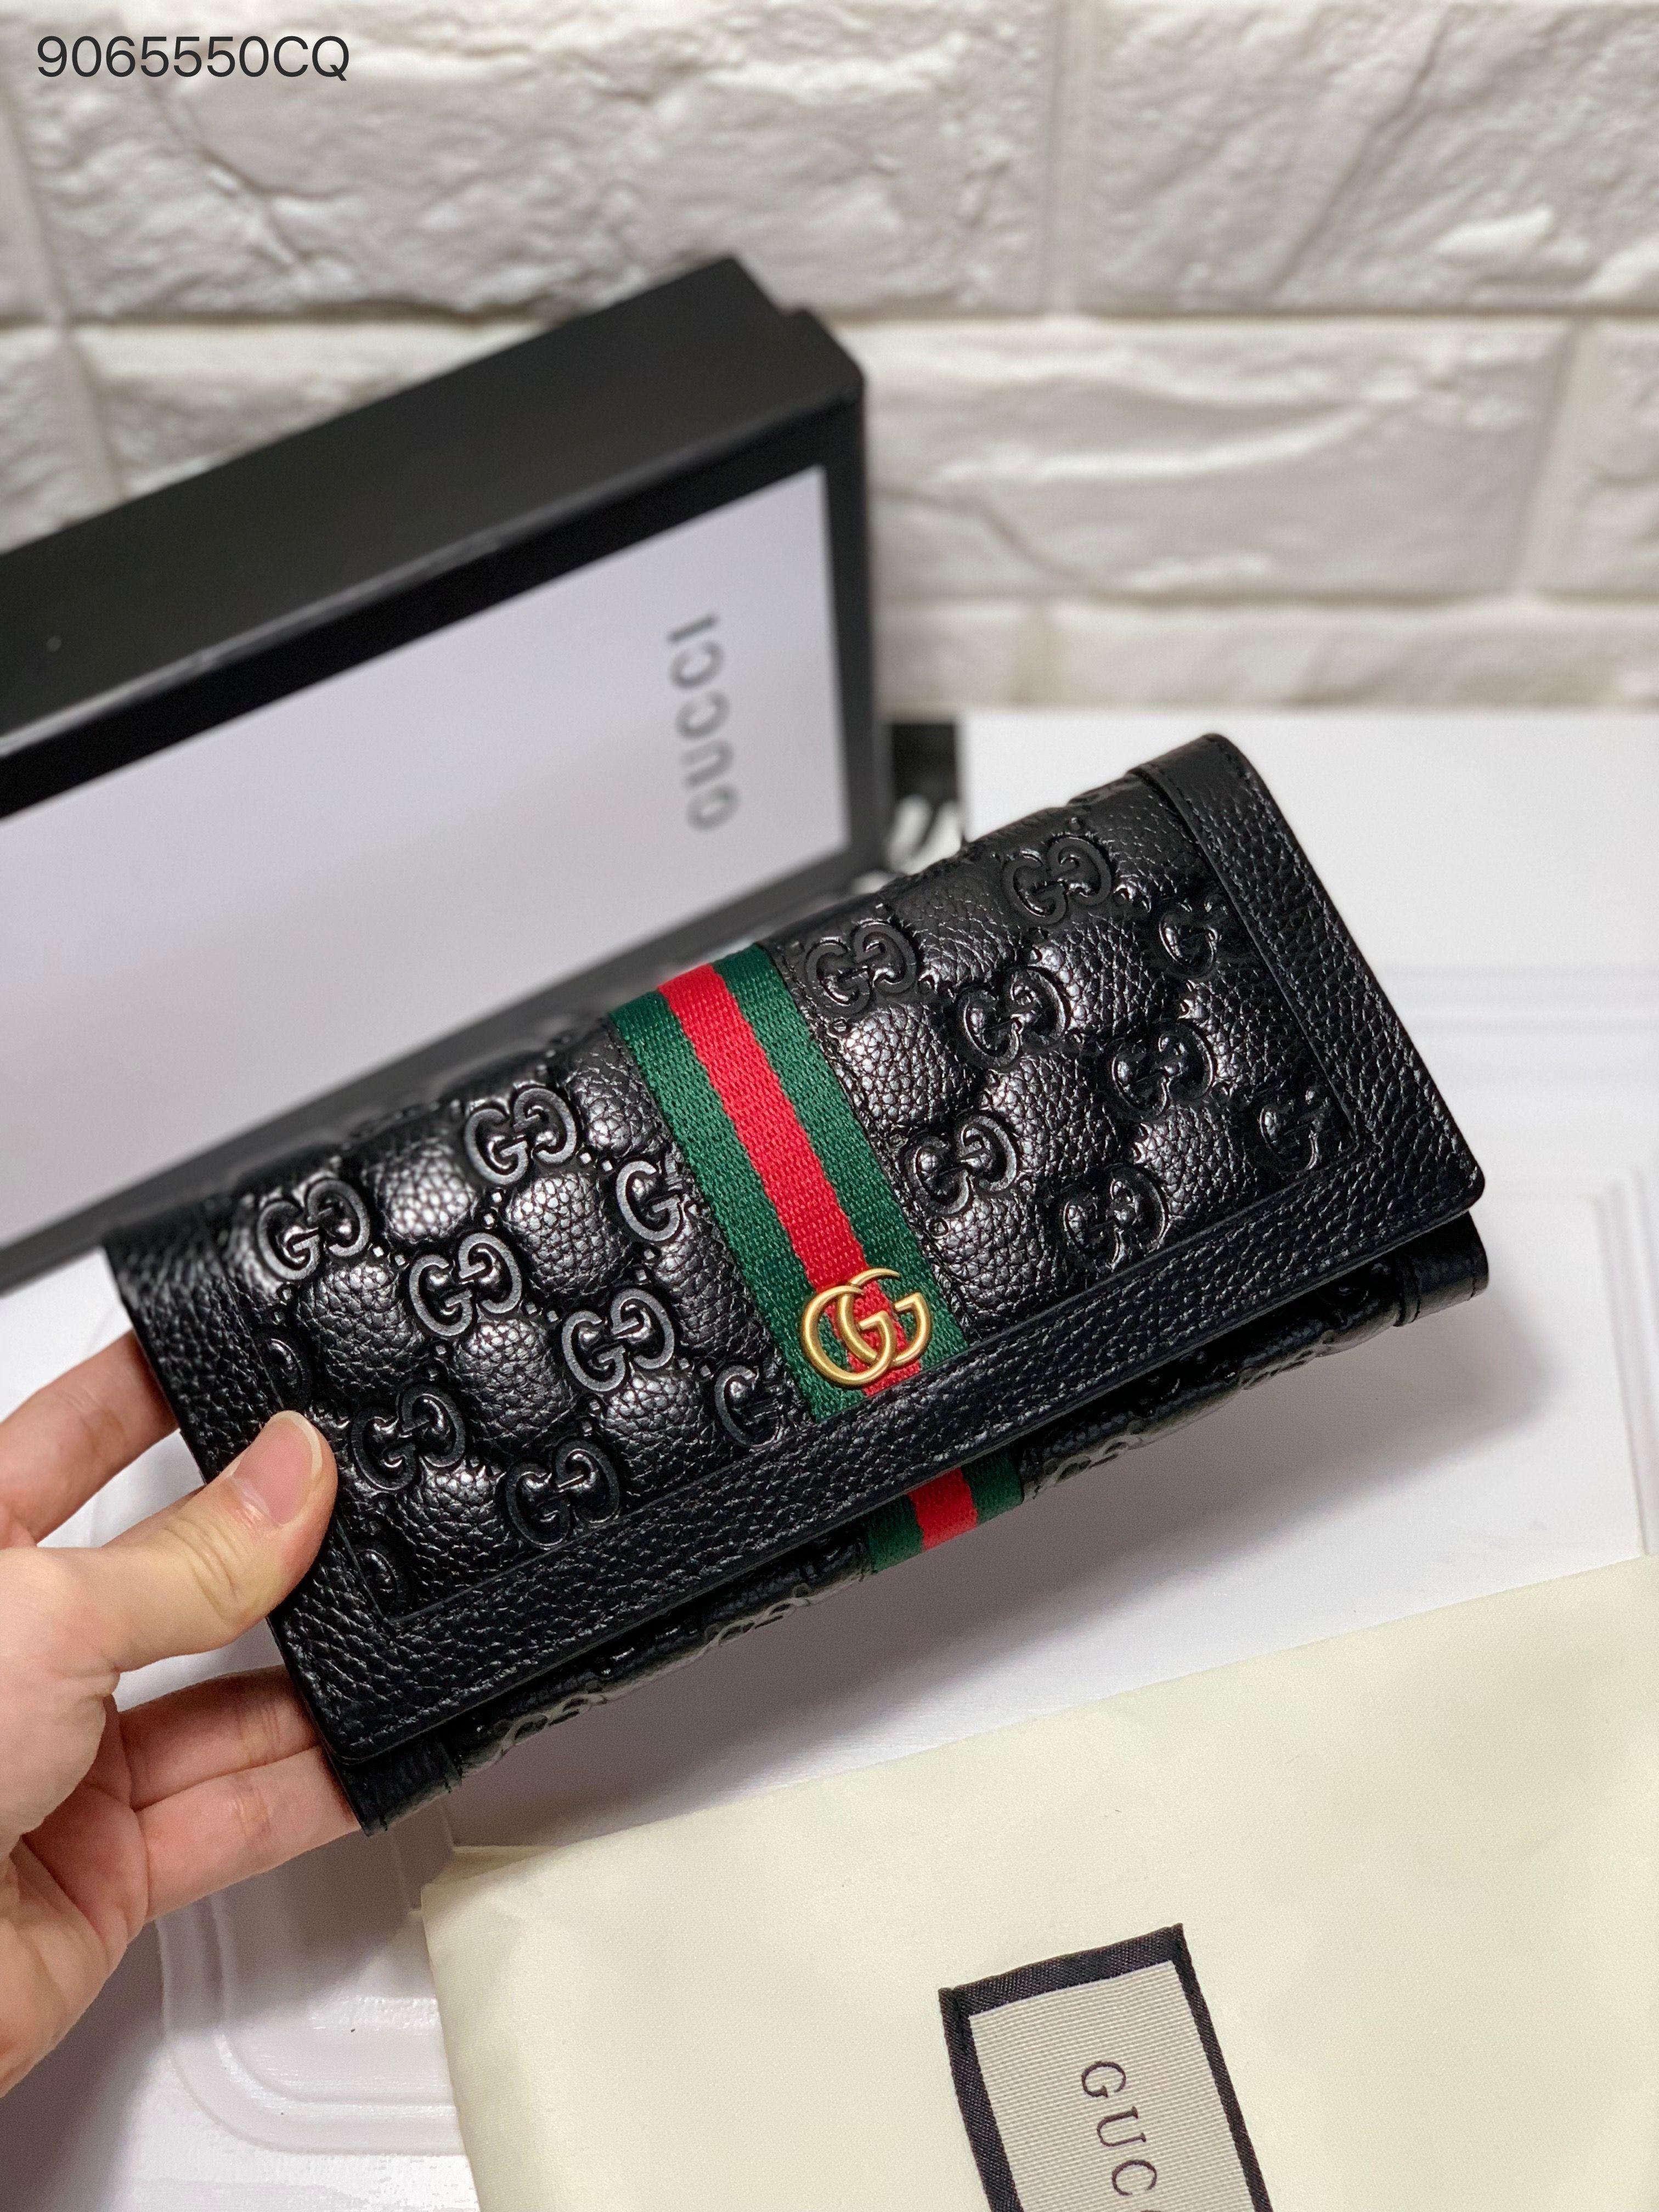 0640fc563050 Gucci woman wallet 1:1 #gucciwalletwomens | Handbags in 2019 | Gucci ...